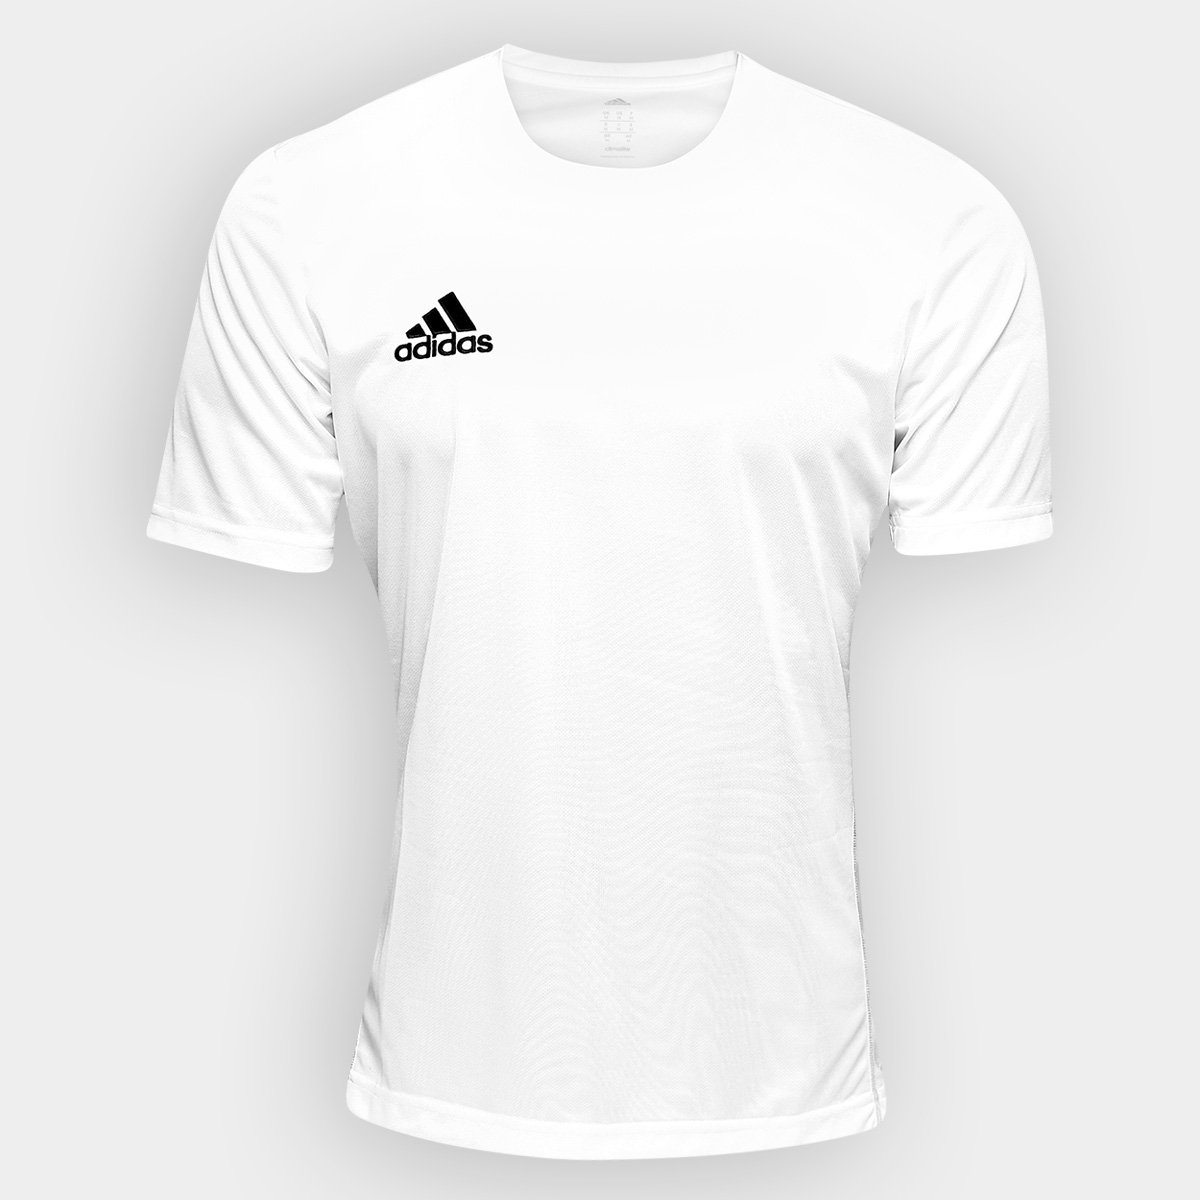 0cfec523913 Camisa Adidas Core 15 Treino Masculina - Branco e Preto - Compre Agora